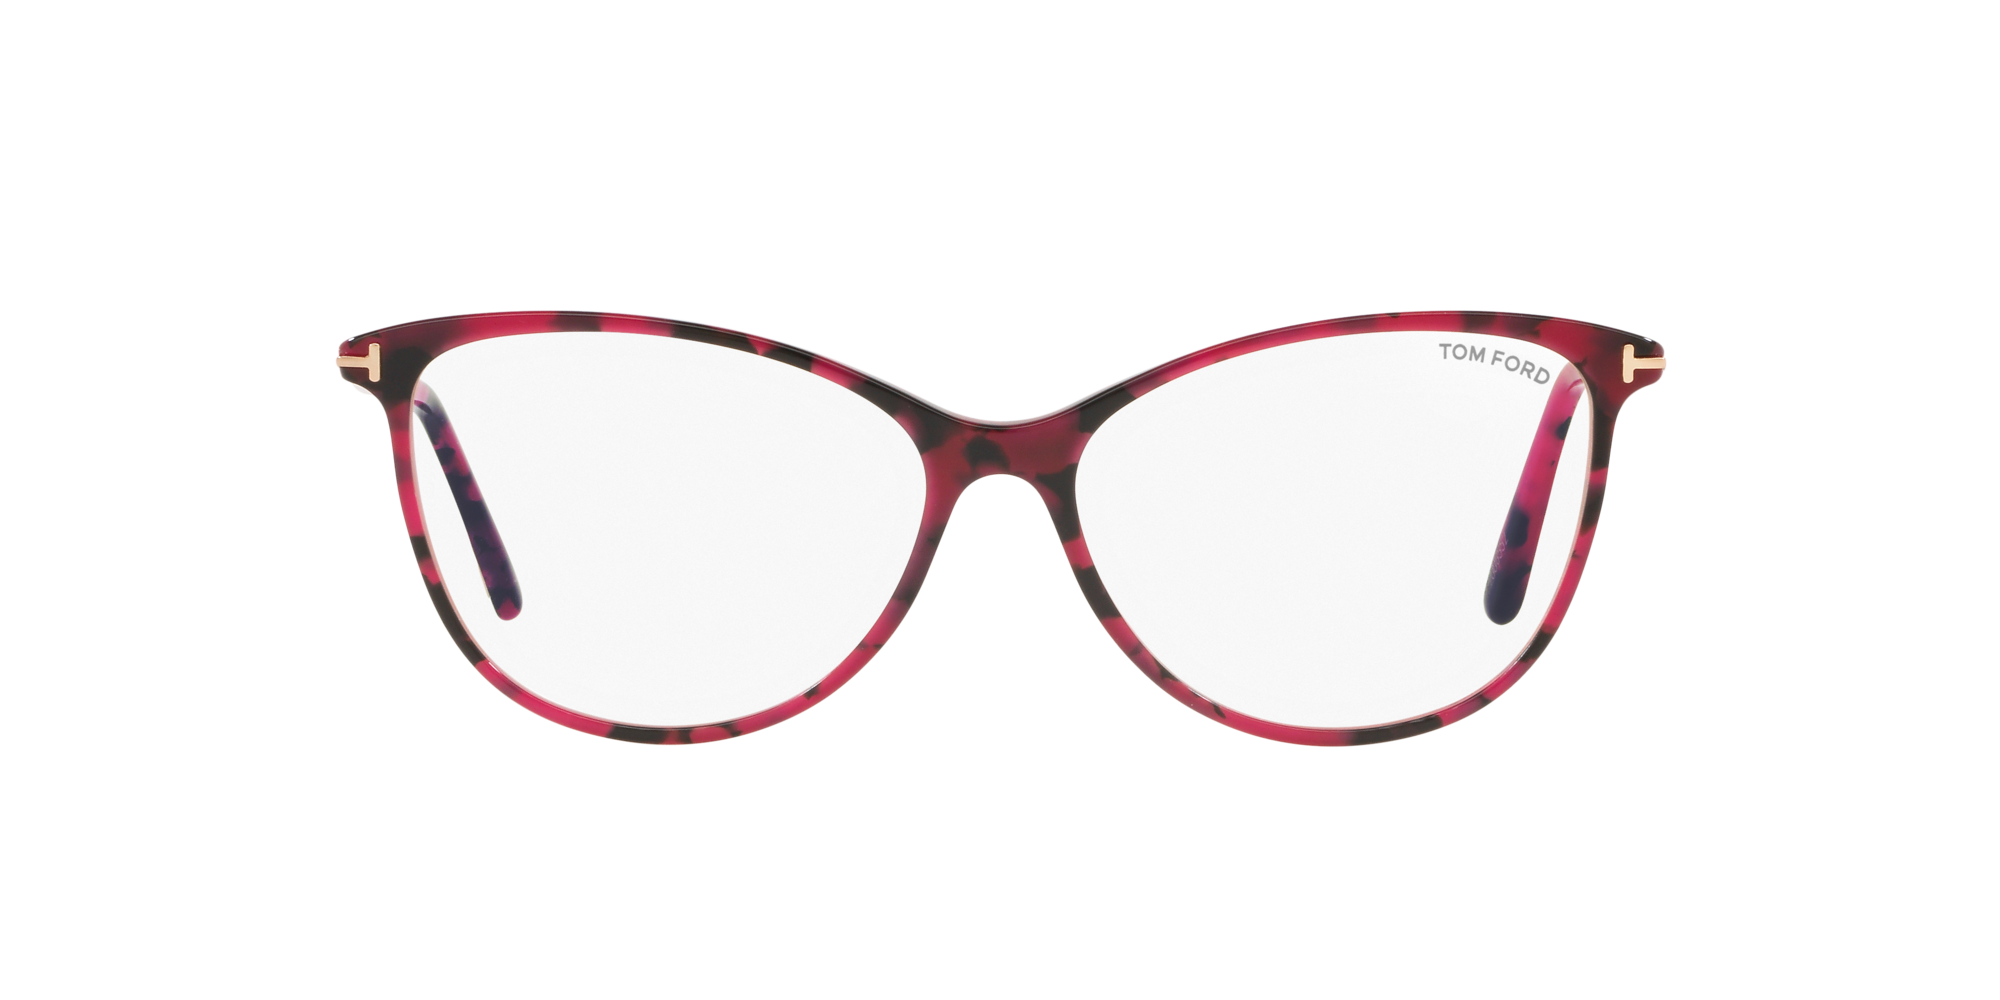 Image for FT5616-B from LensCrafters | Glasses, Prescription Glasses Online, Eyewear